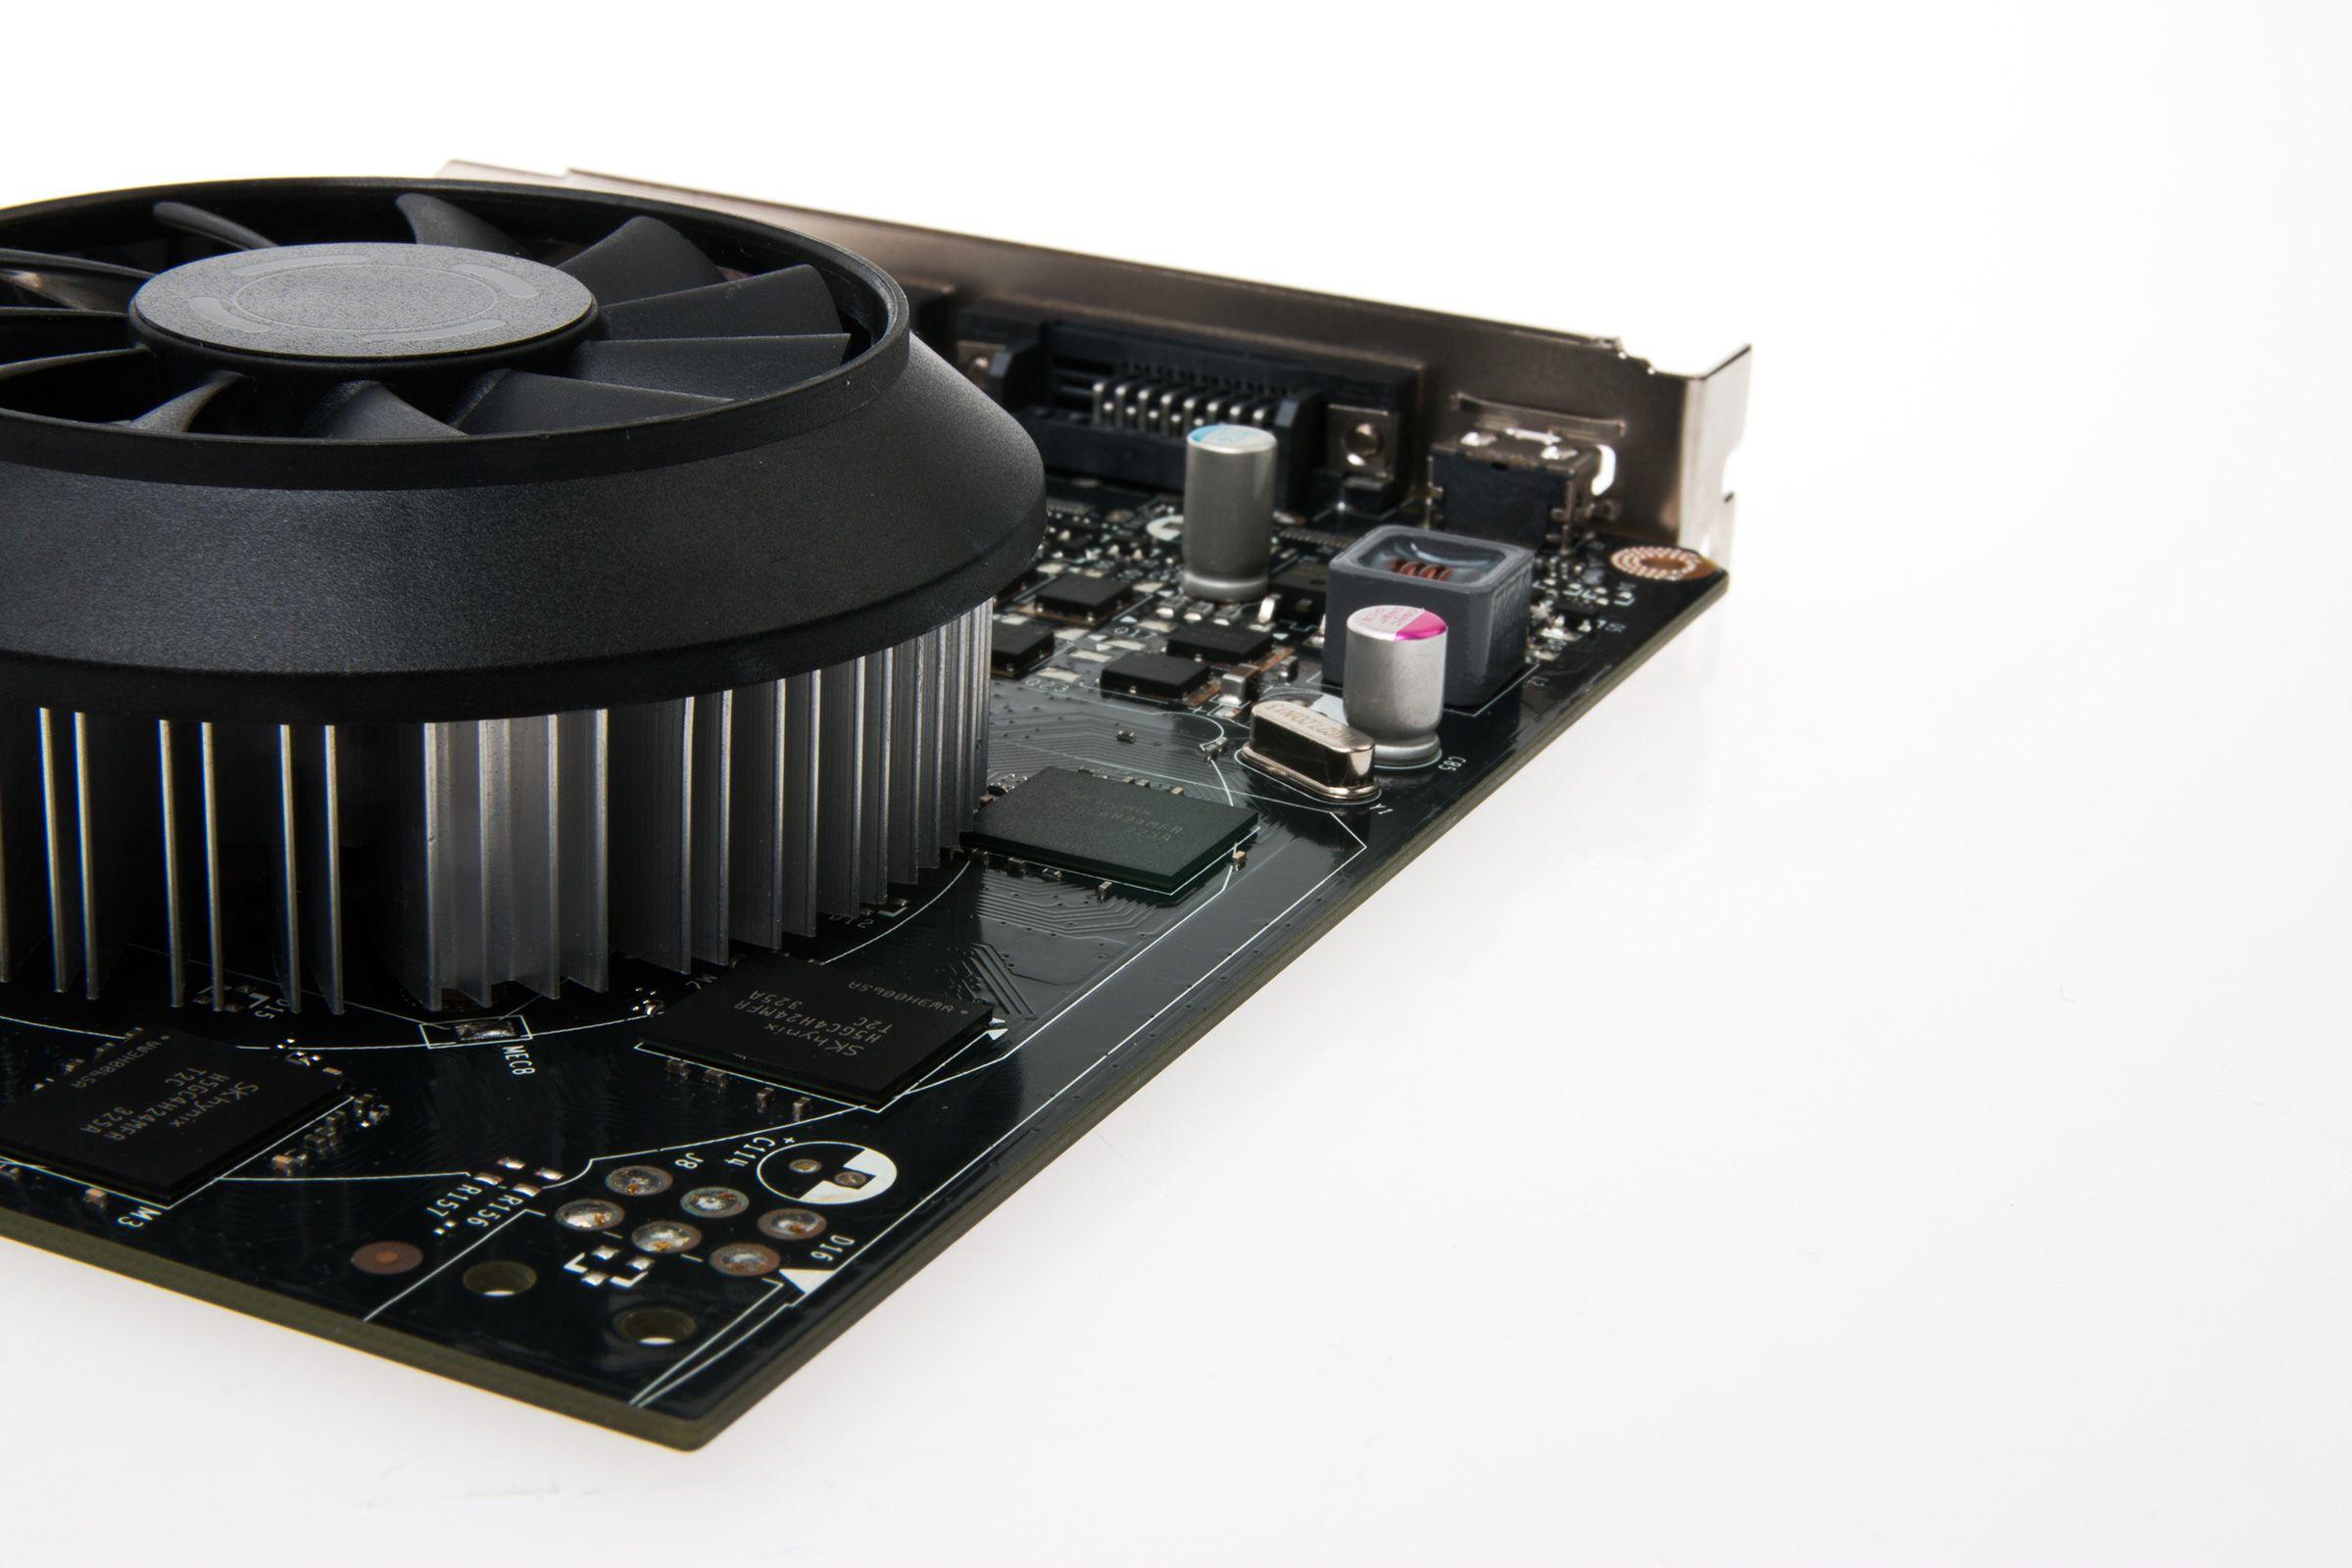 Mangelen på SLI-muligheter skyldes at Nvidia heller ville prioritere G-Sync for GeForce GTX 750 Ti.Foto: Varg Aamo, Hardware.no